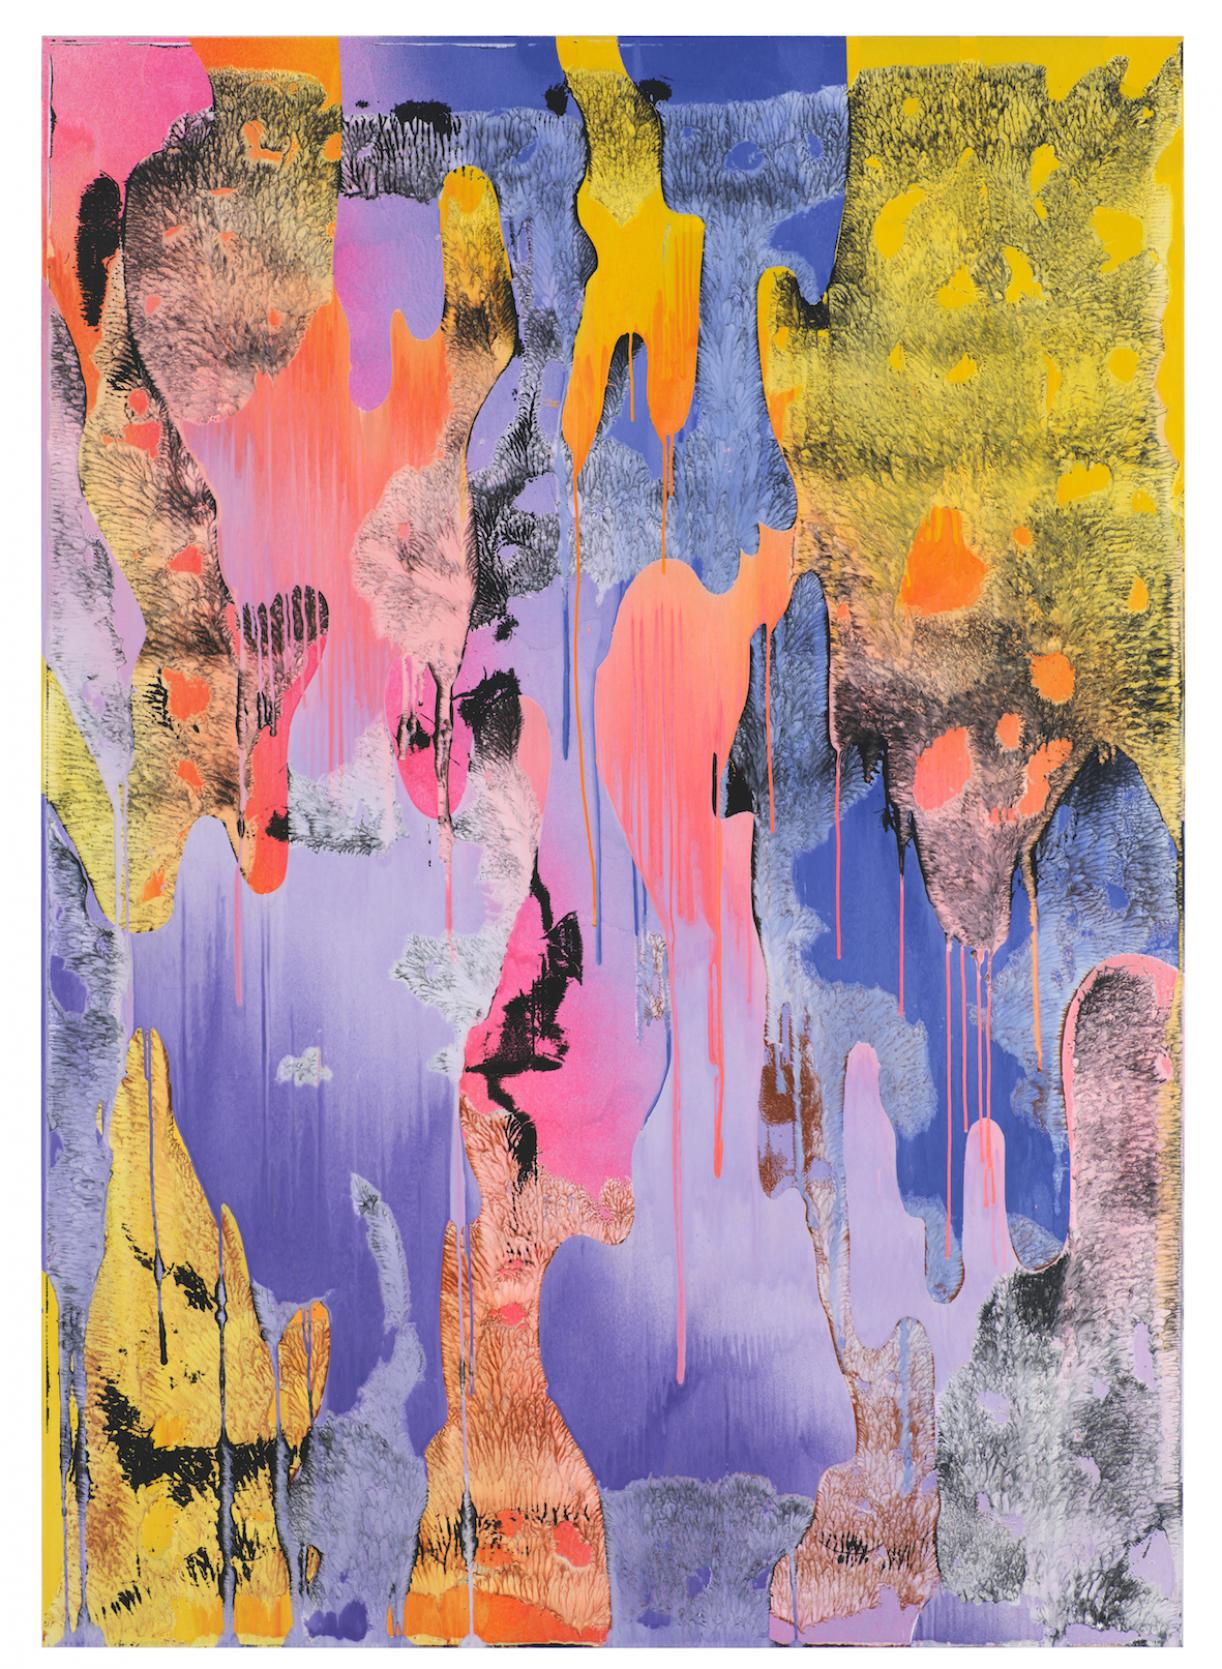 Christine Streuli, Warainting_011, 2016/17, Mixed media on canvas, 243,5 x 173 cm